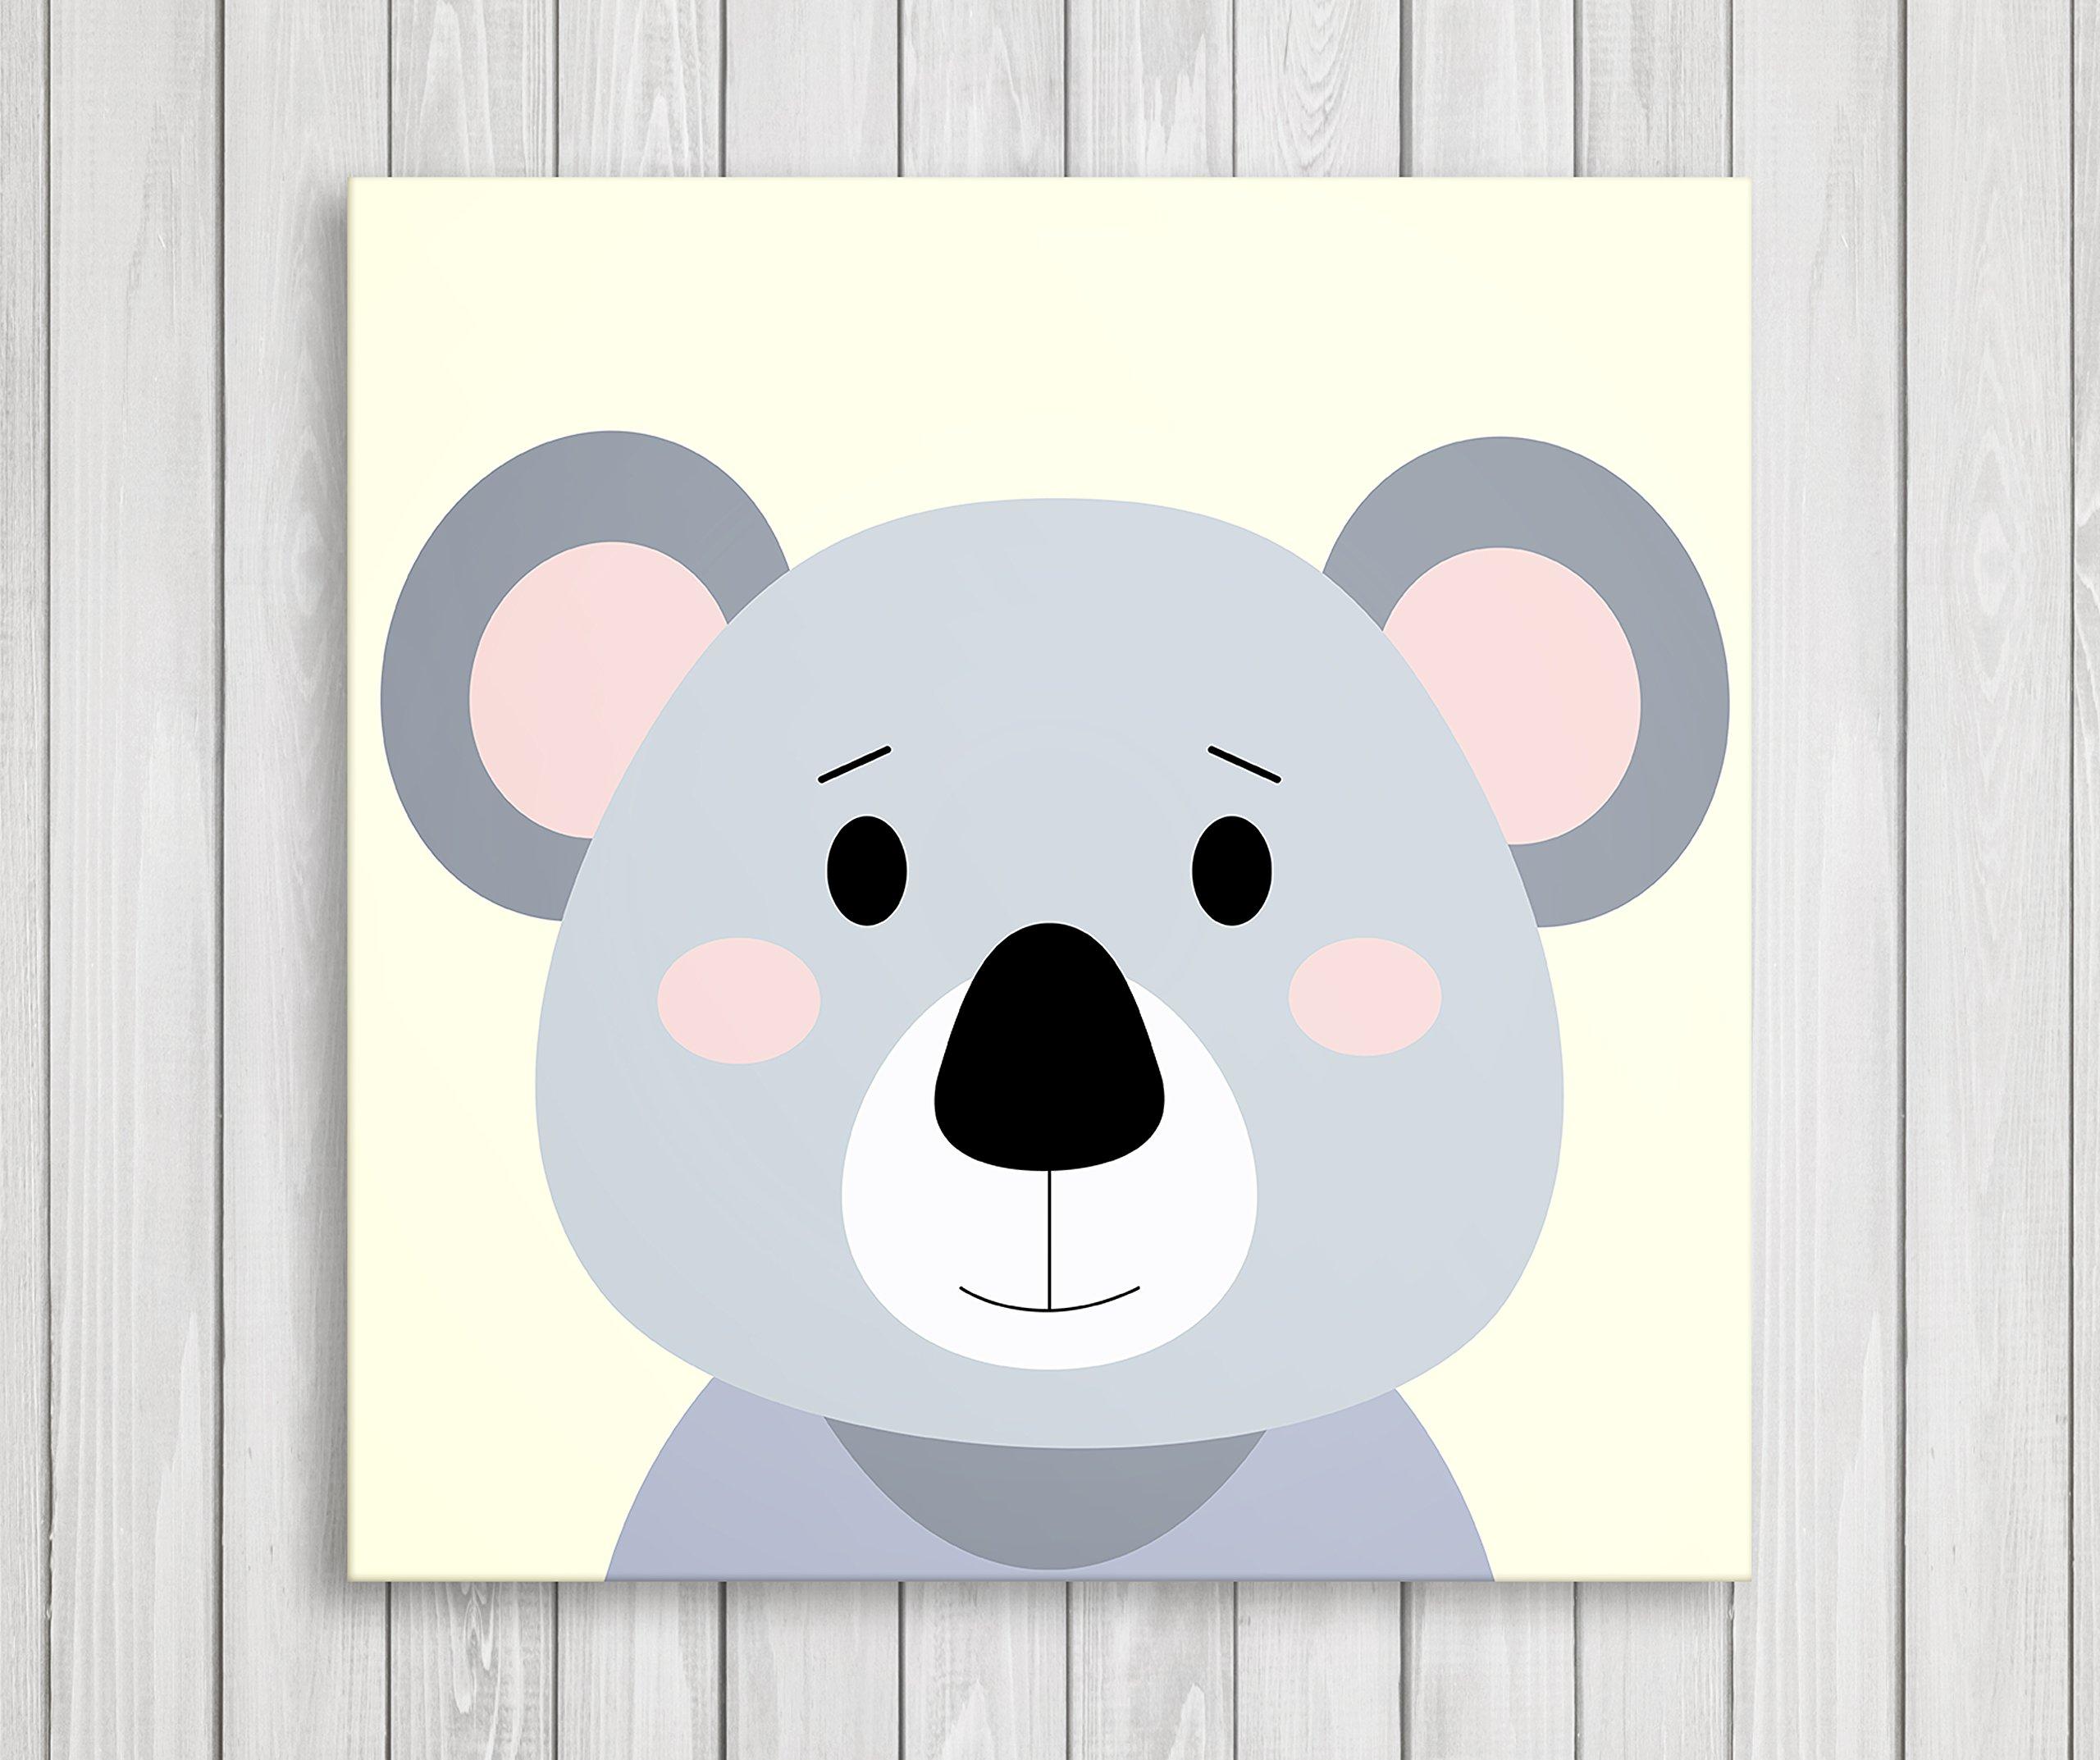 Nursery Prints Cute Koala Baby Wall Decor Animals Kids Room Pictures